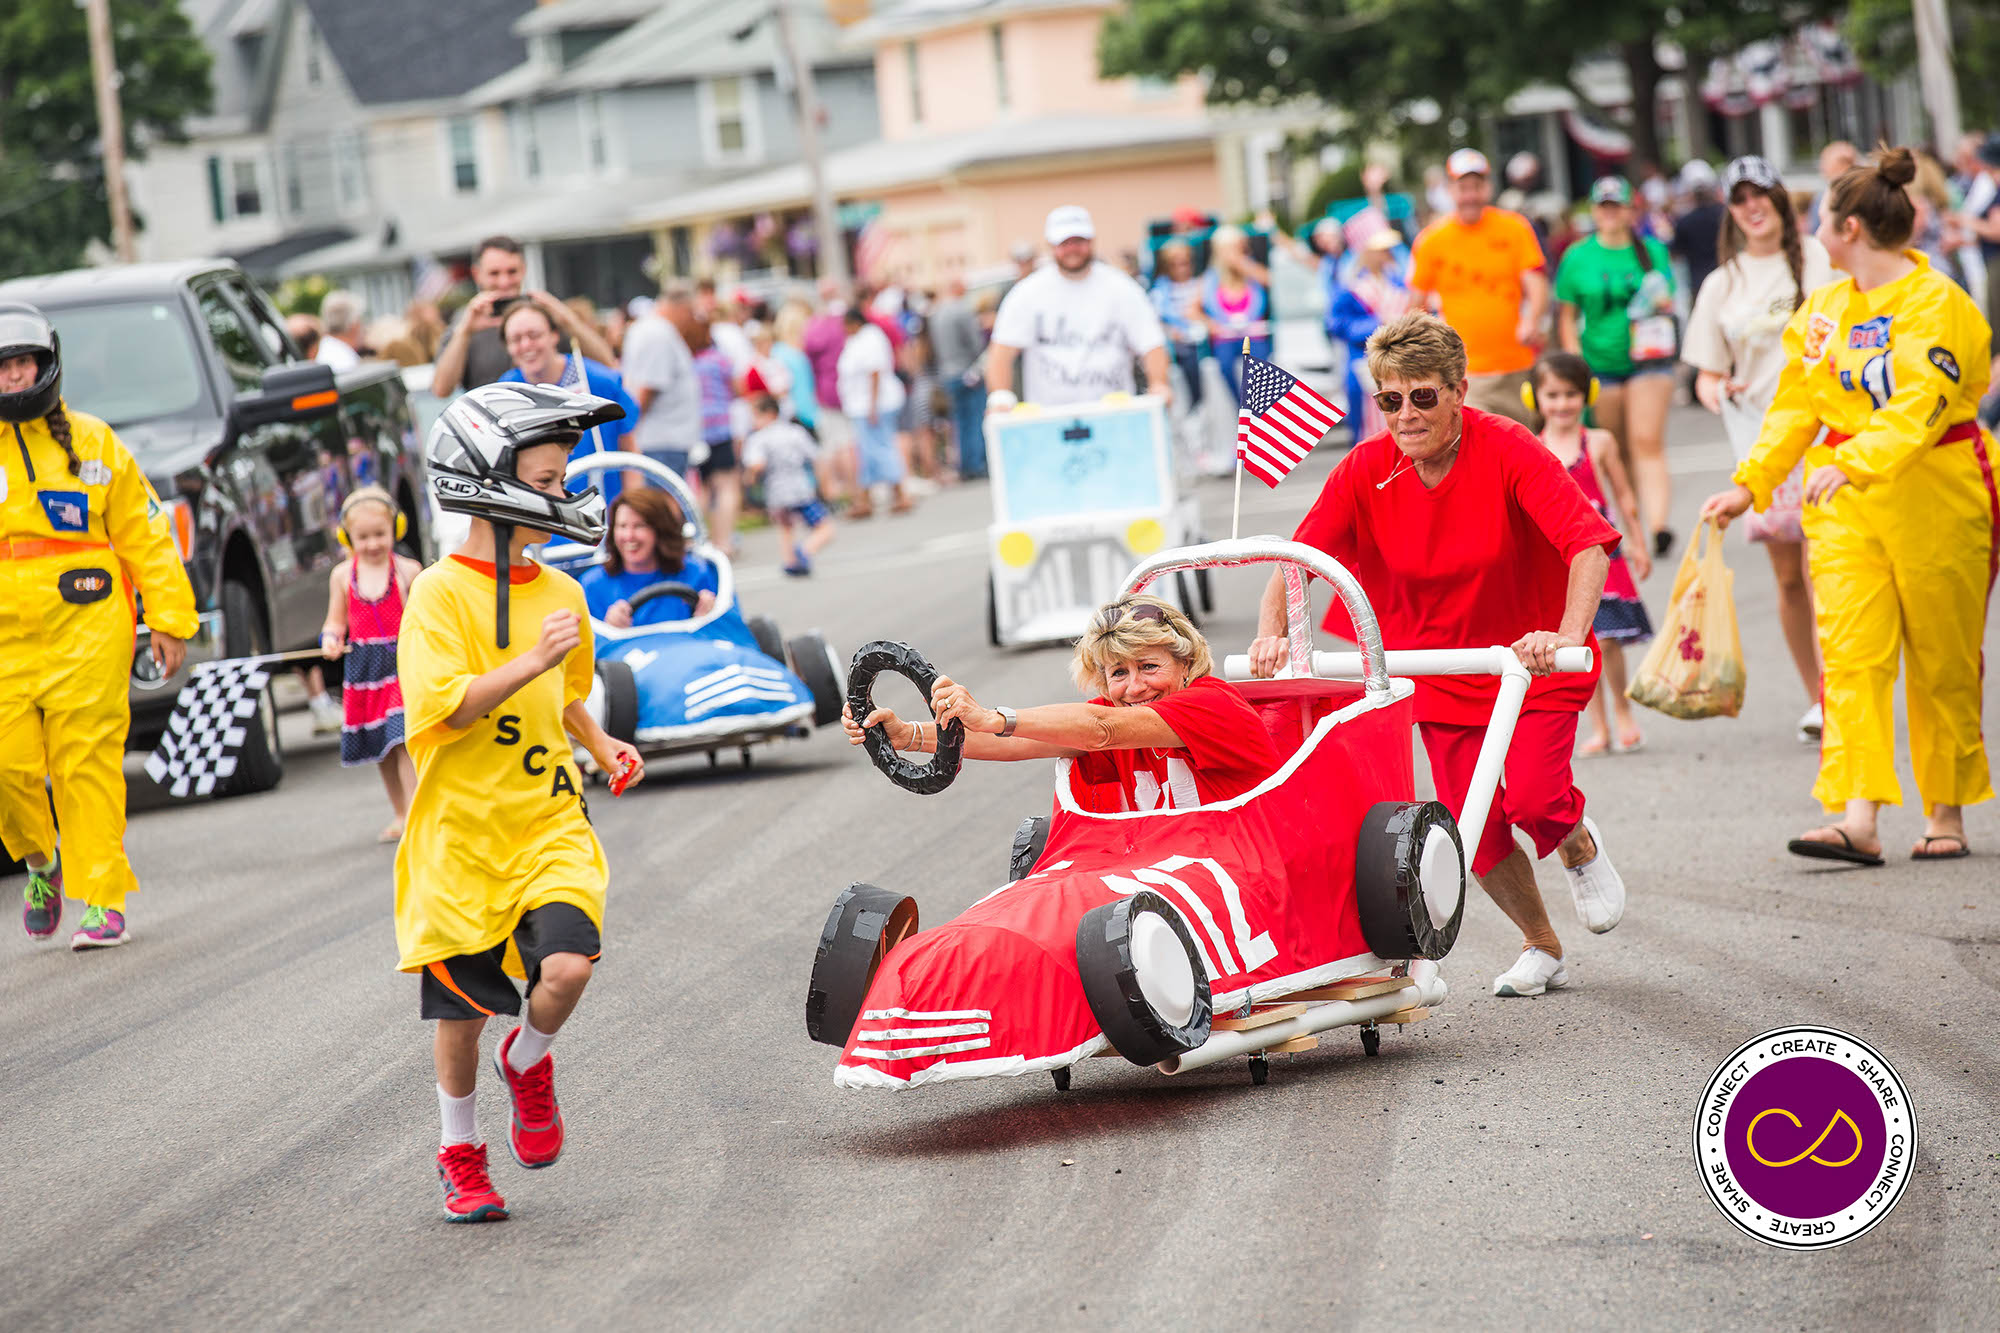 fourth-of-july-salem-horribles-parade-creative-salem_3030_19454369345_o.jpg